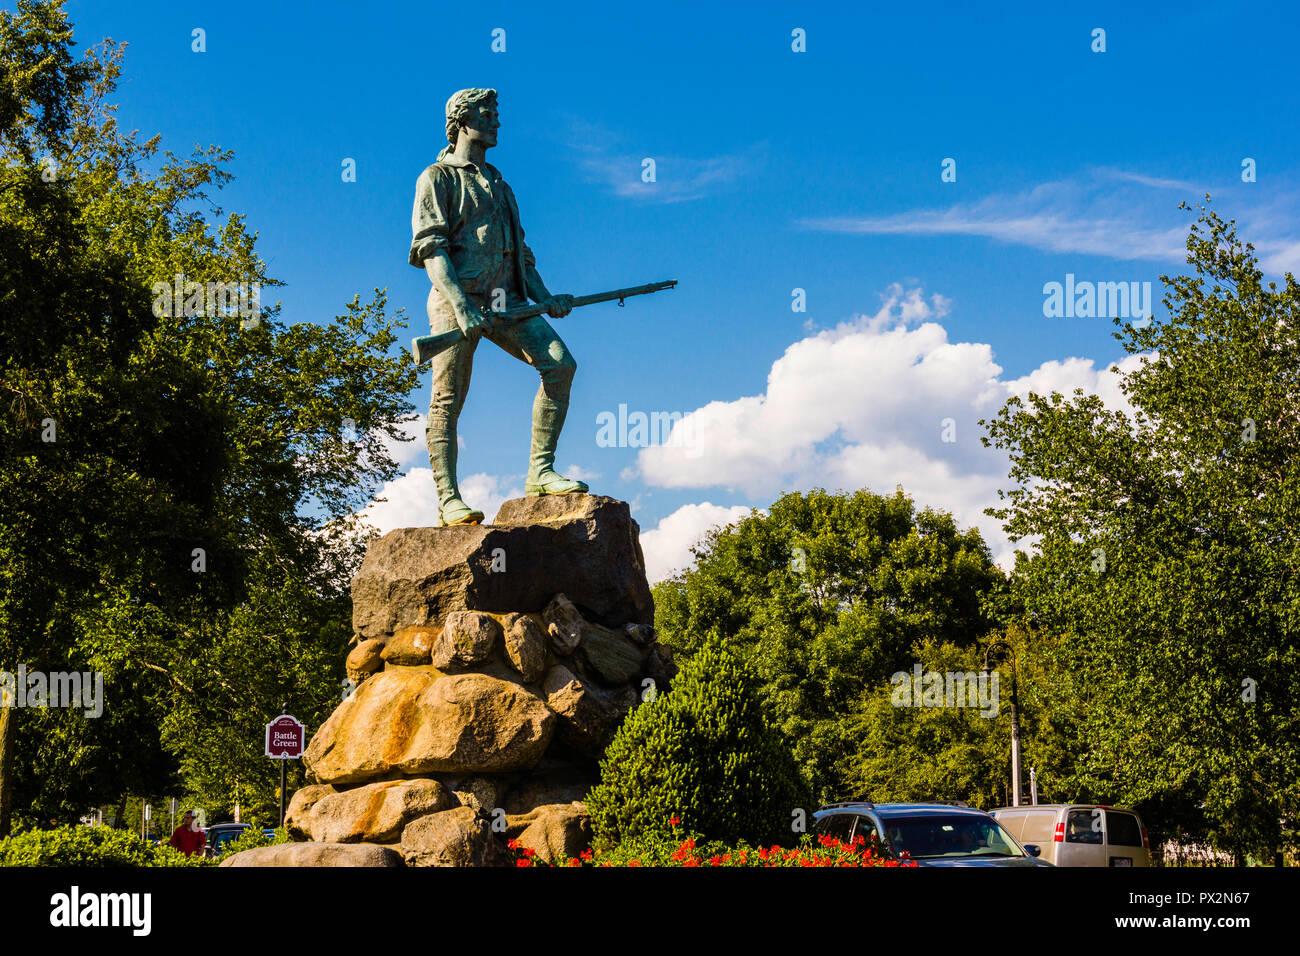 El Minuteman estatua Lexington Battle Green _ Lexington, Massachusetts, EE.UU. Foto de stock